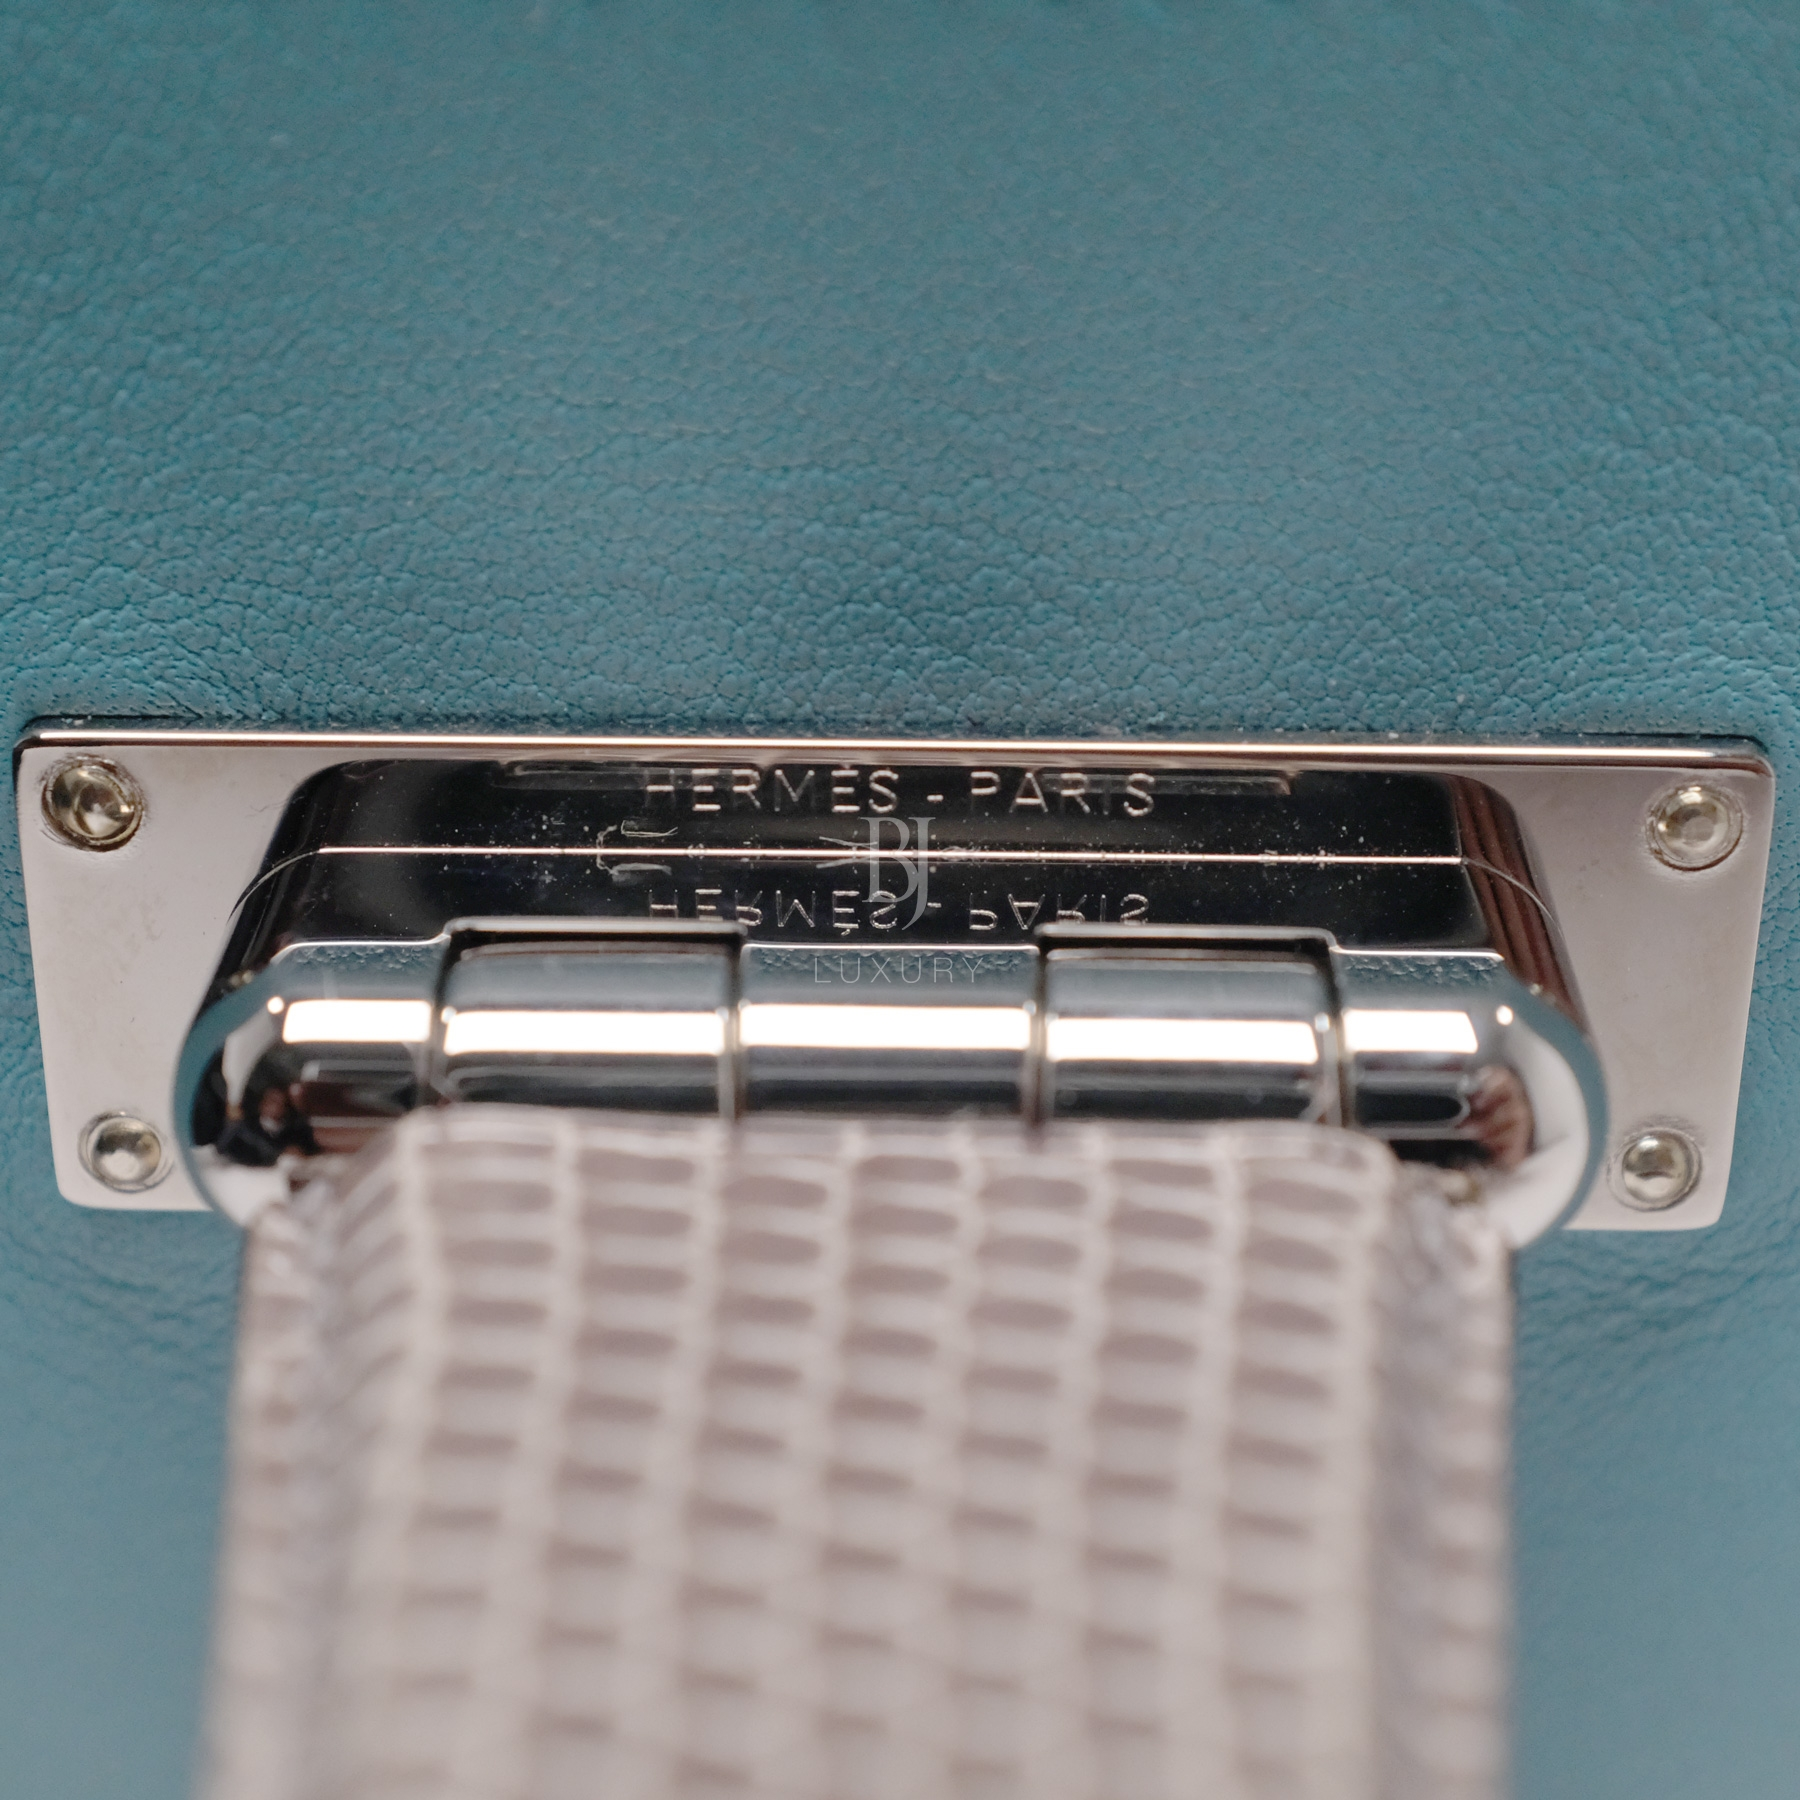 Hermes Conveyor Bag 16 Turquoise Swift Lizard Palladium BJ Luxury 13.jpg